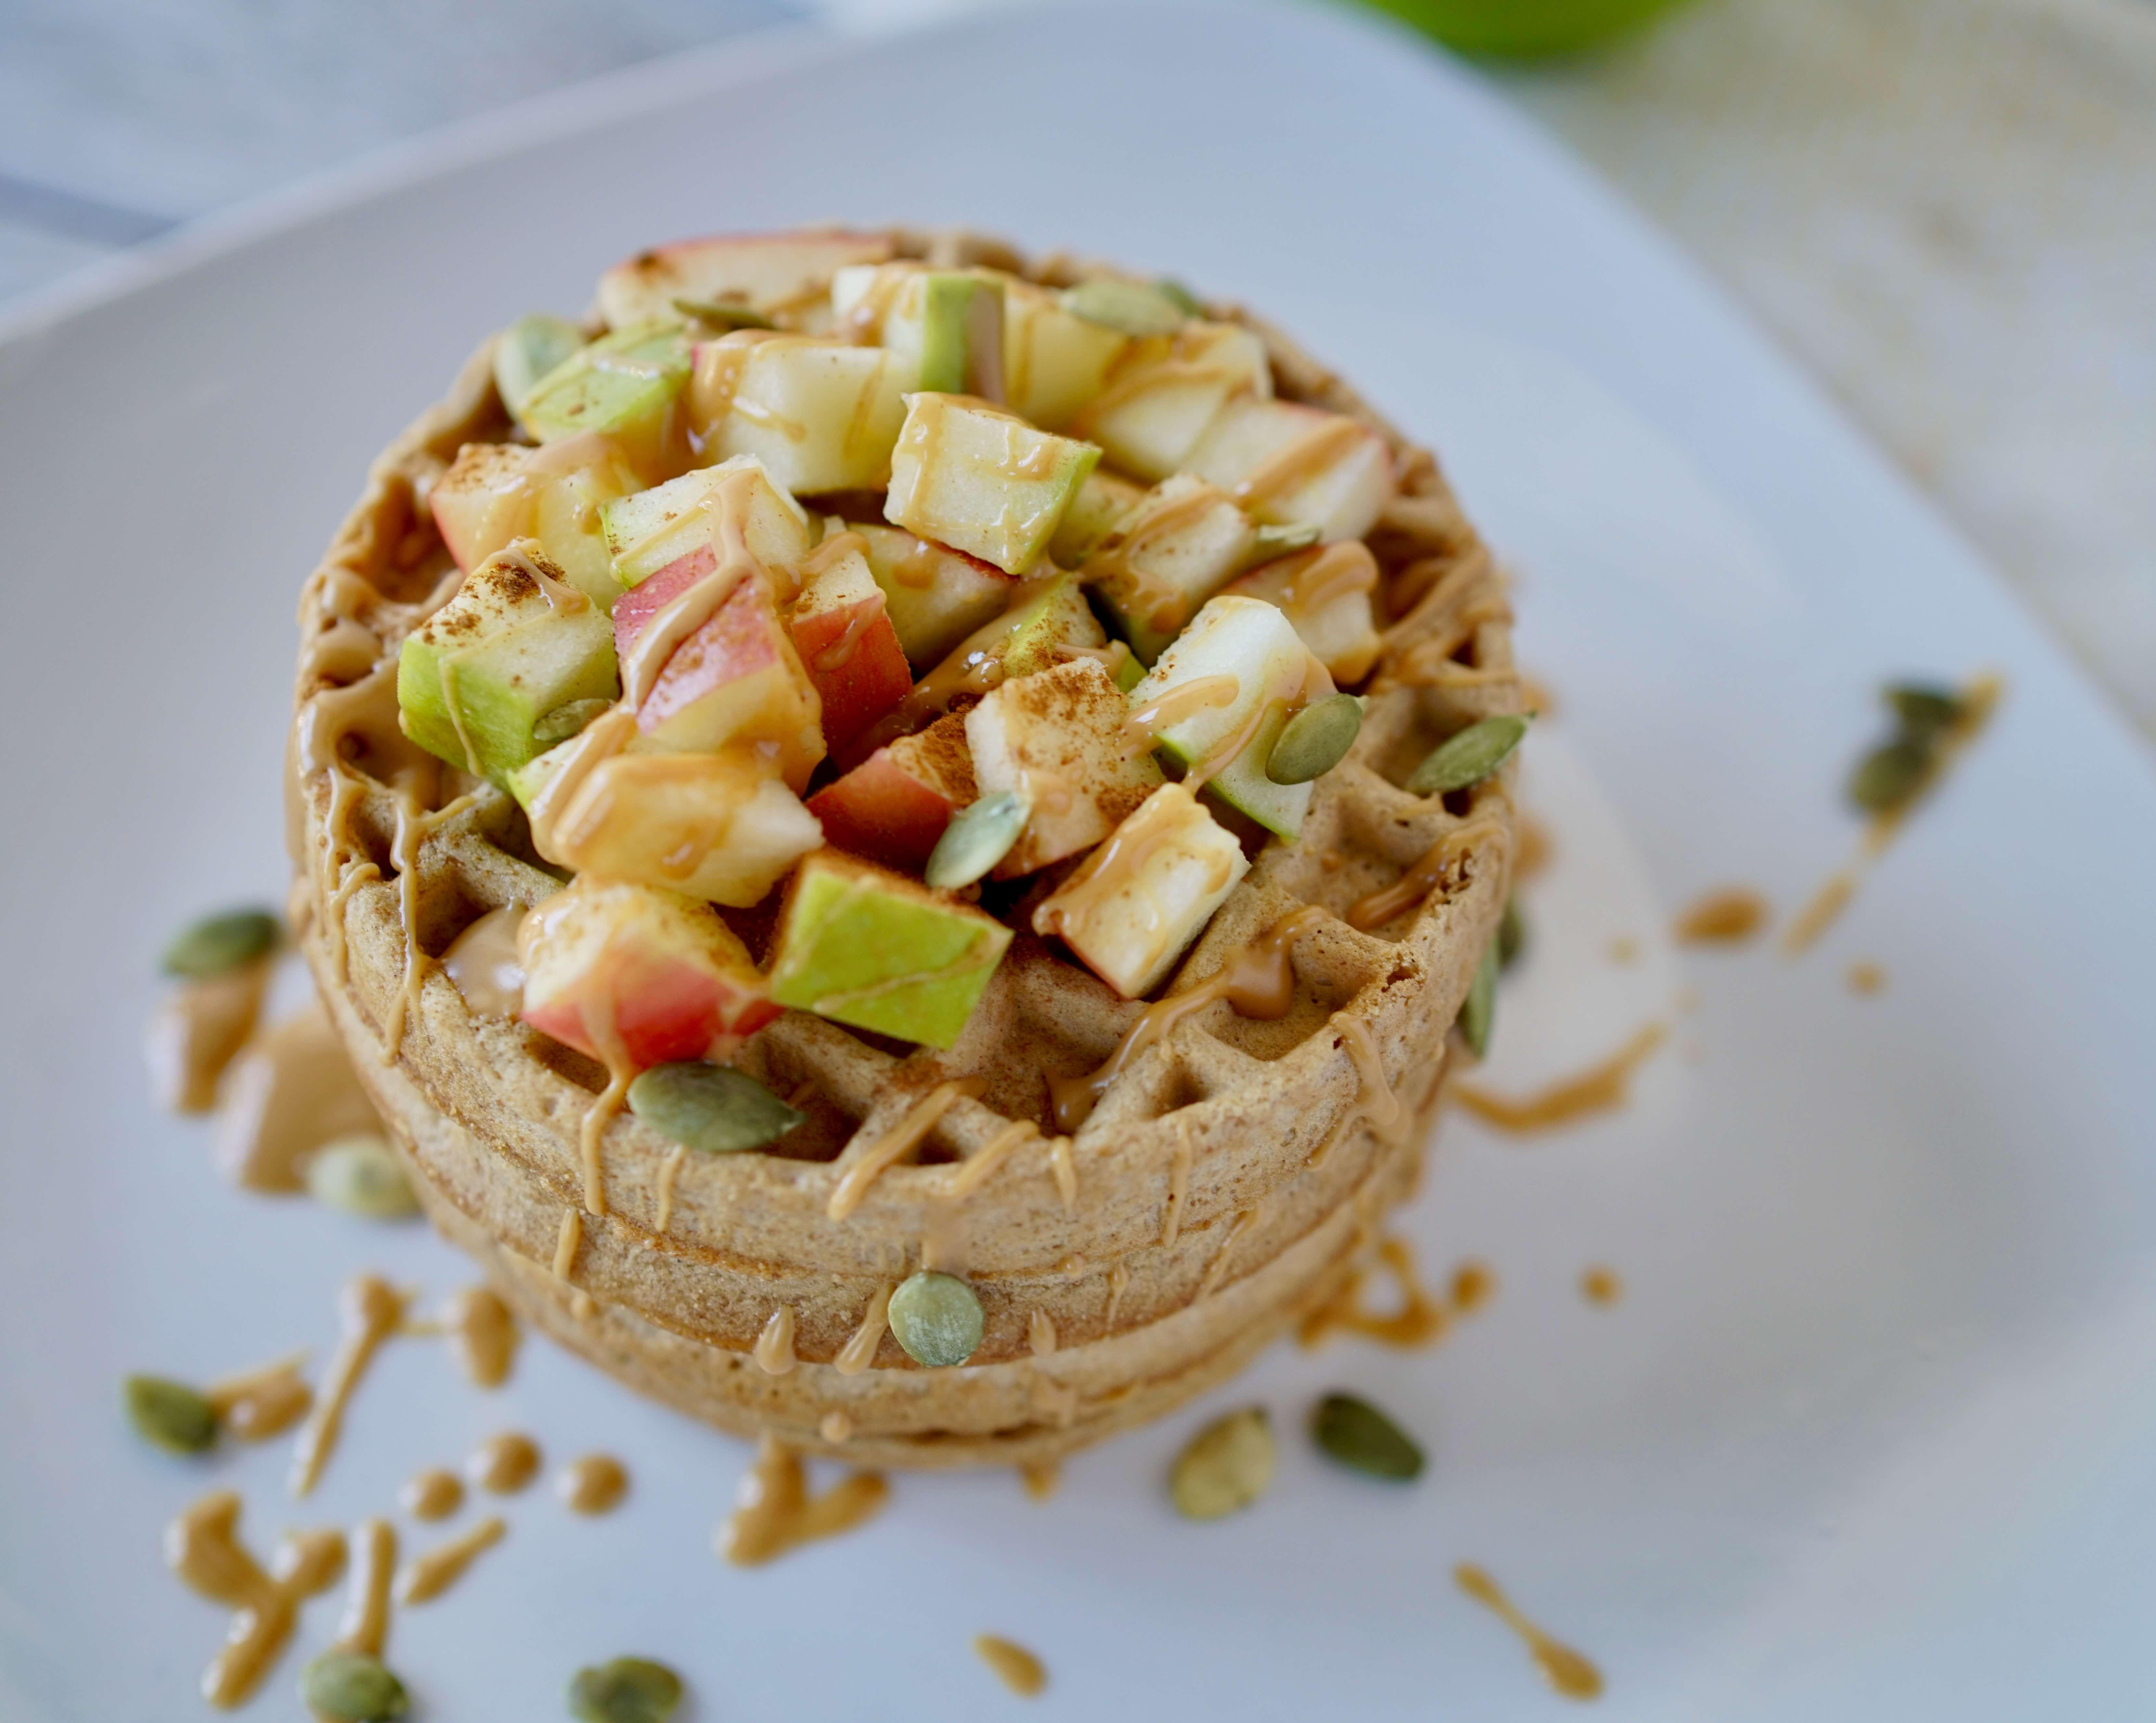 Apple and Cinnamon Peanut Butter Waffles